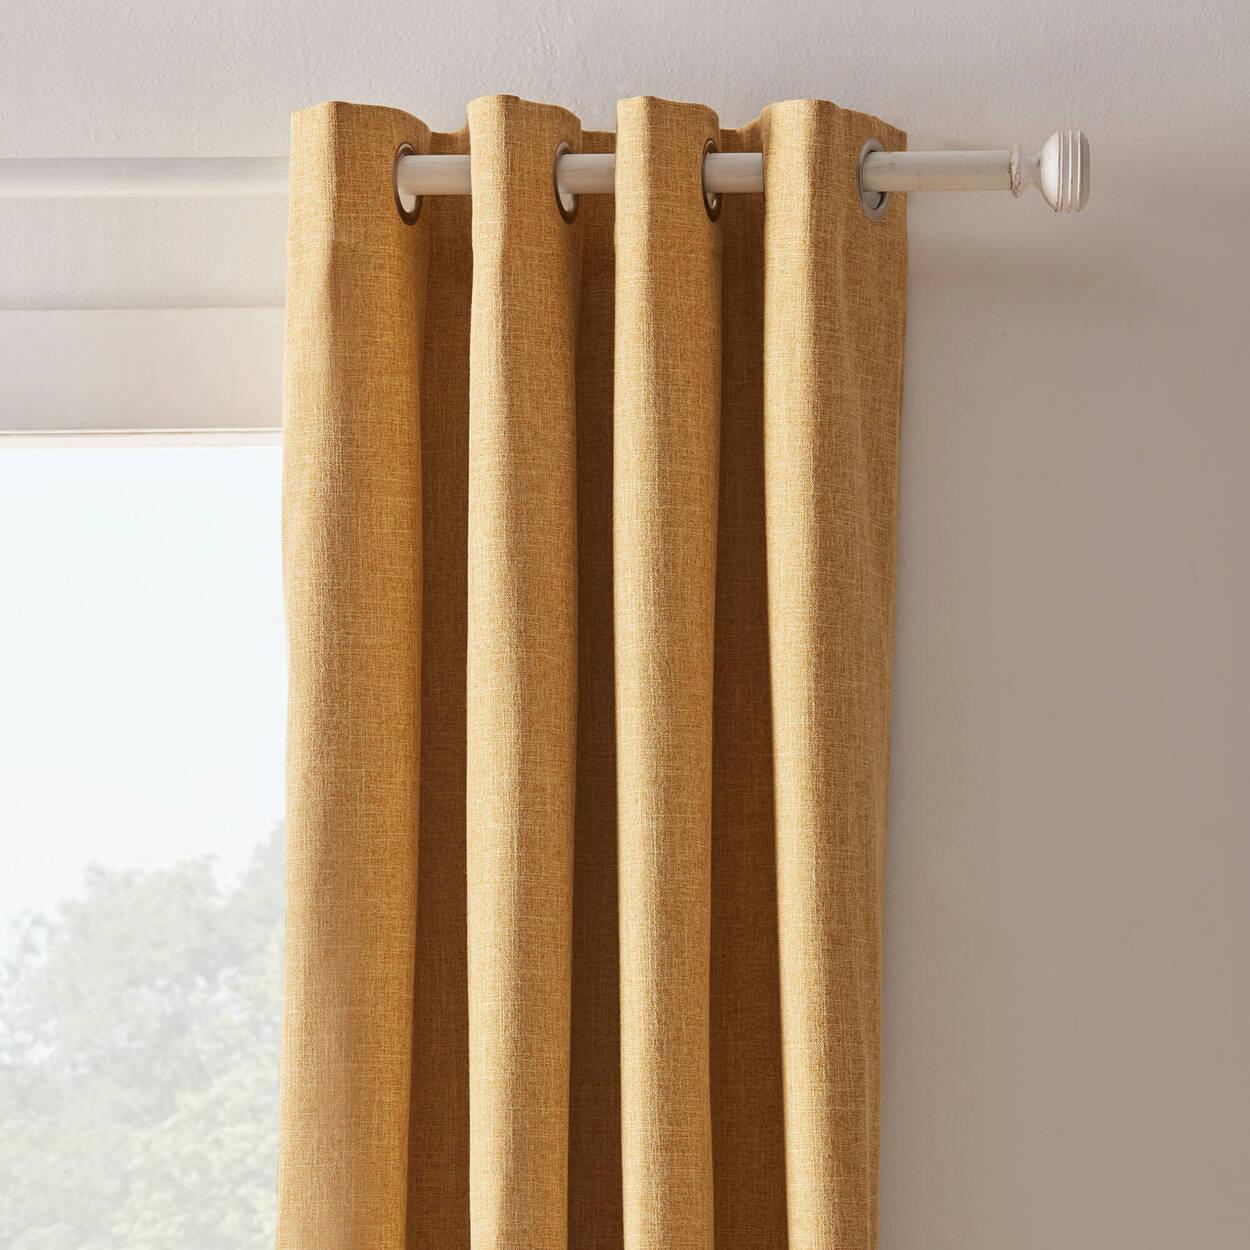 Vintage Finish Curtain Rod Set - Diameter 25/28 mm